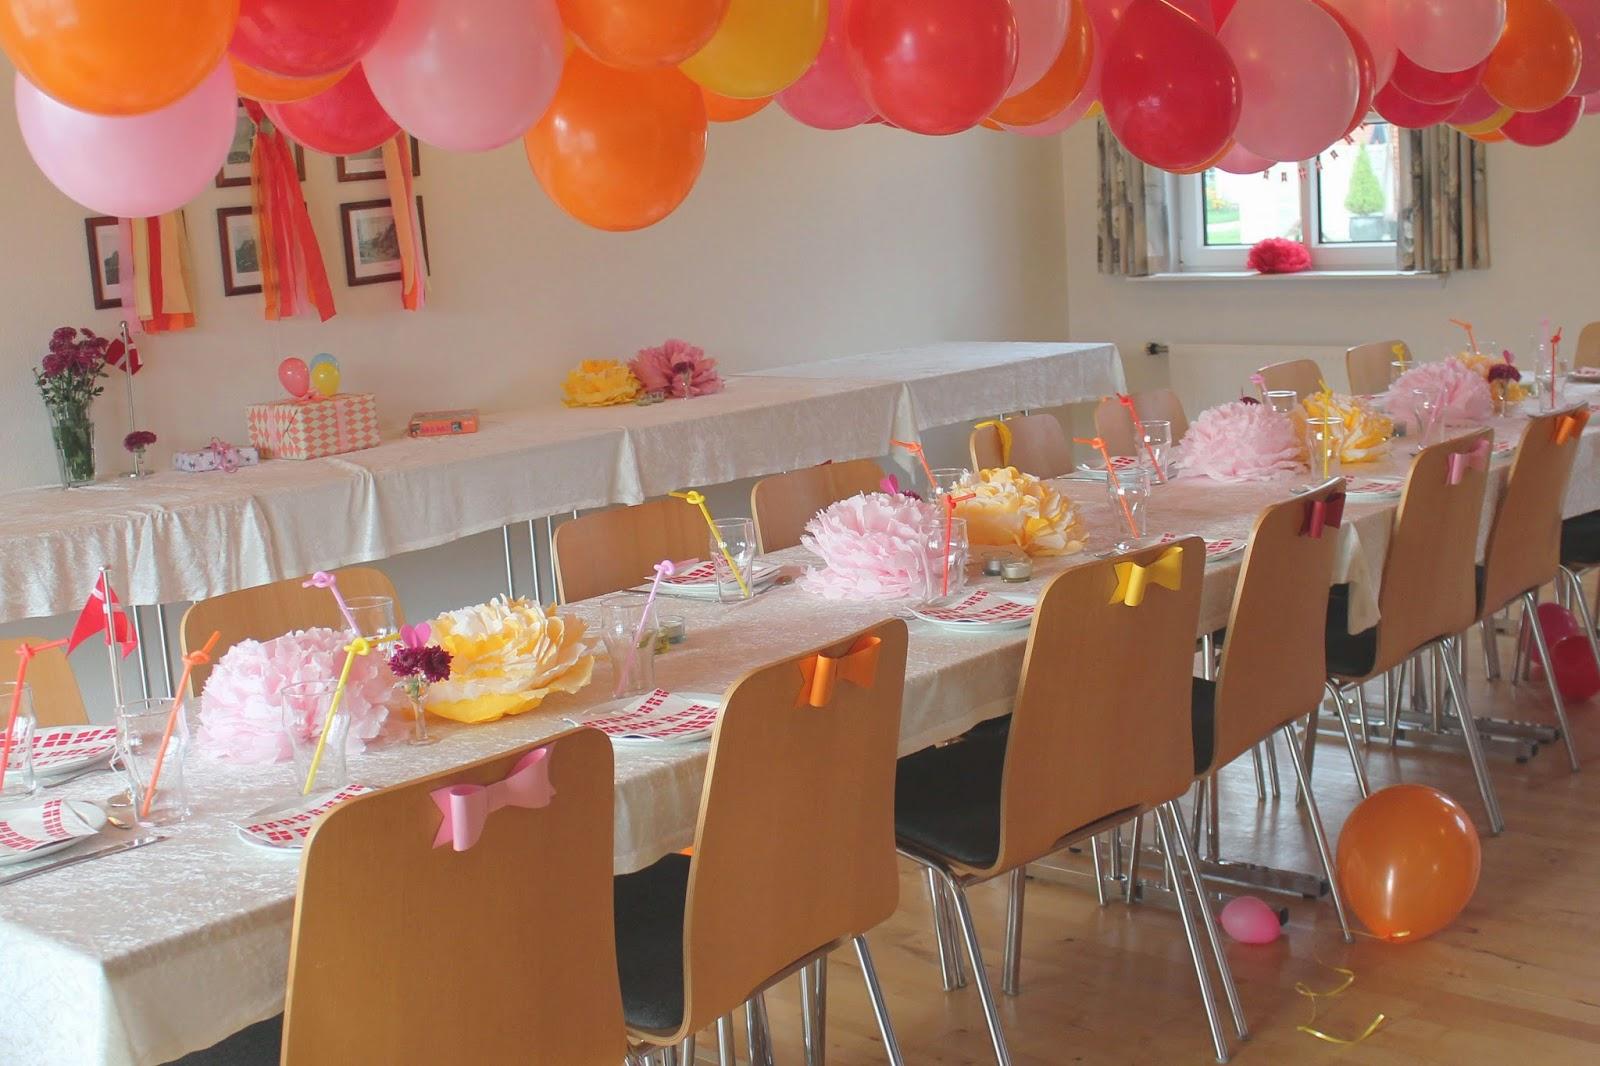 Børnefødselsdag Inspiration børnefødselsdag | denkreativesky